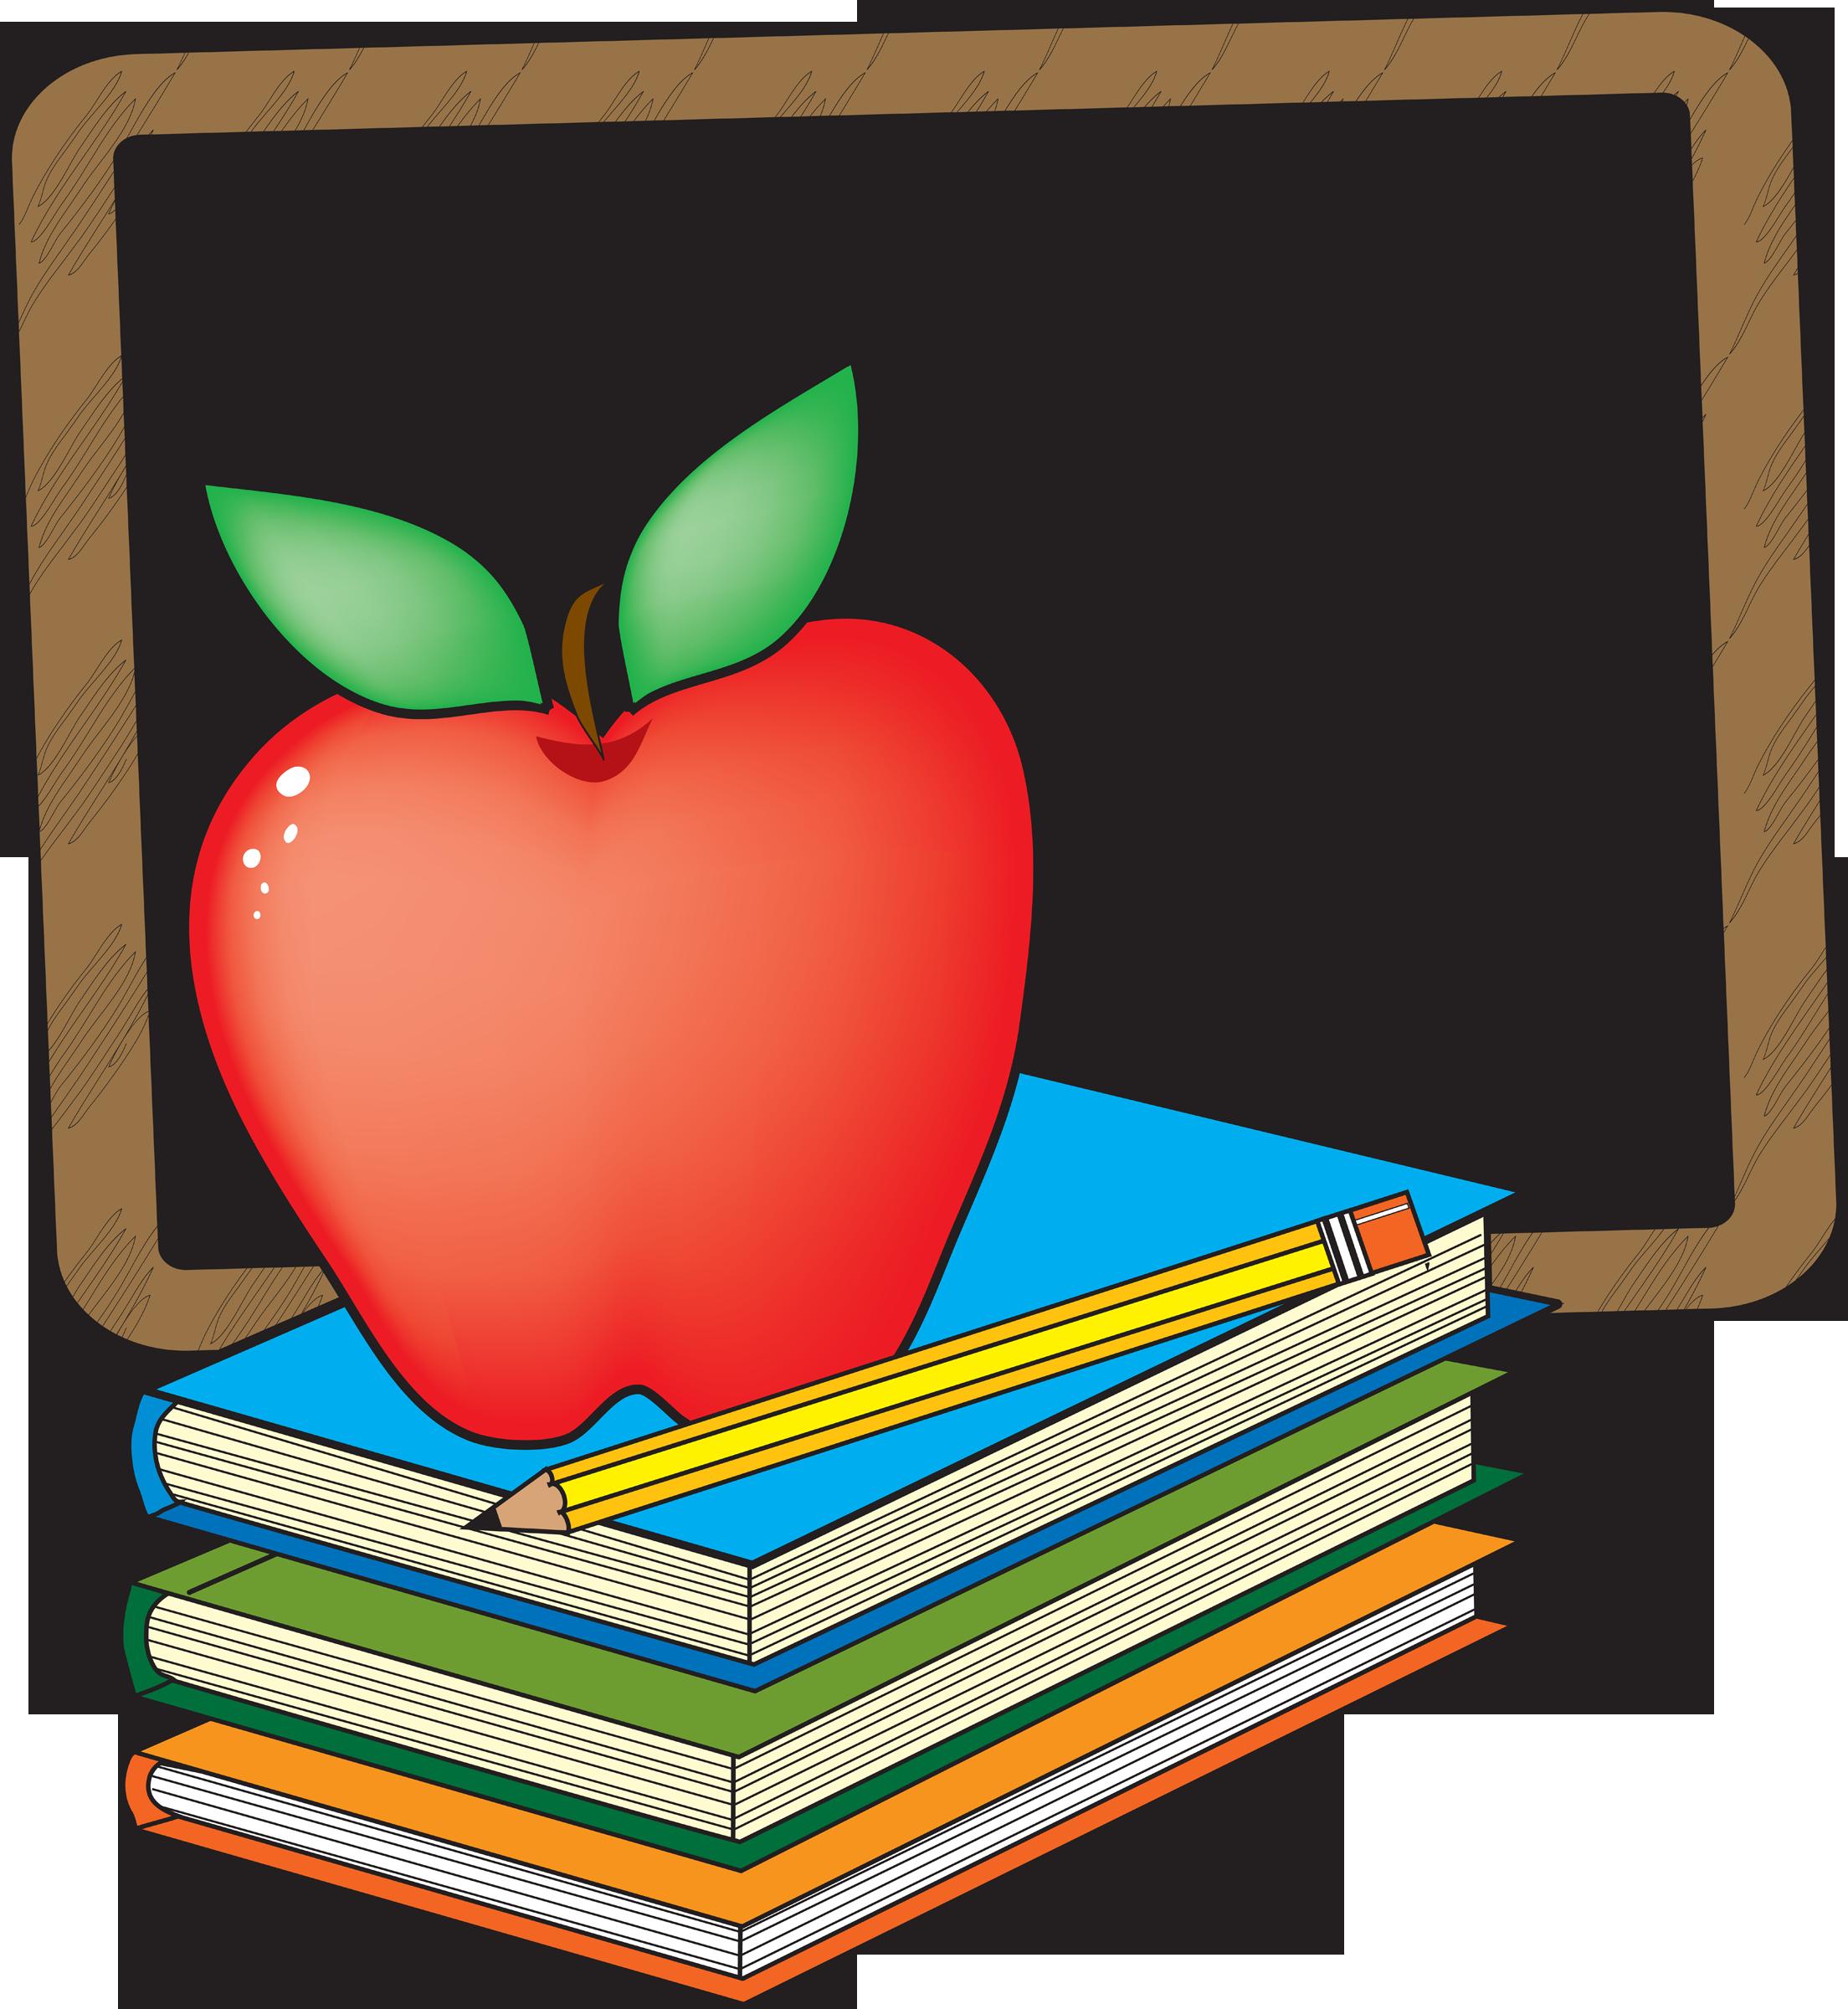 School Books Clipart - School Books Clipart